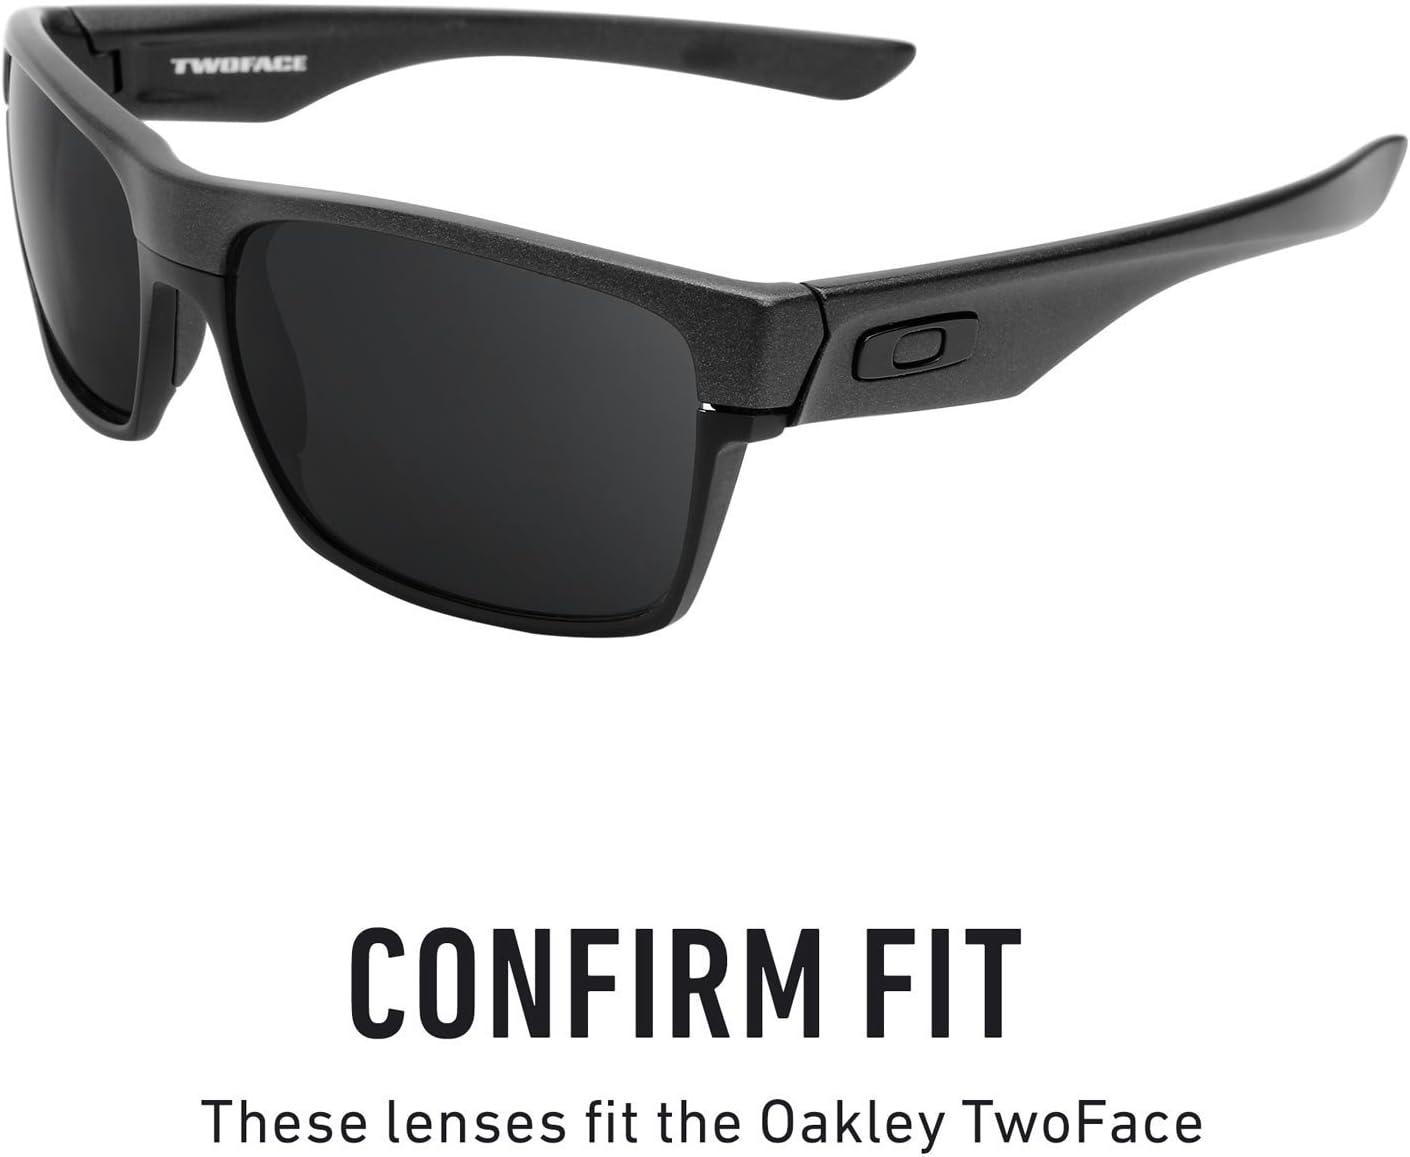 Revant lentes de repuesto para Oakley TwoFace, Elite Adapt Orange ...